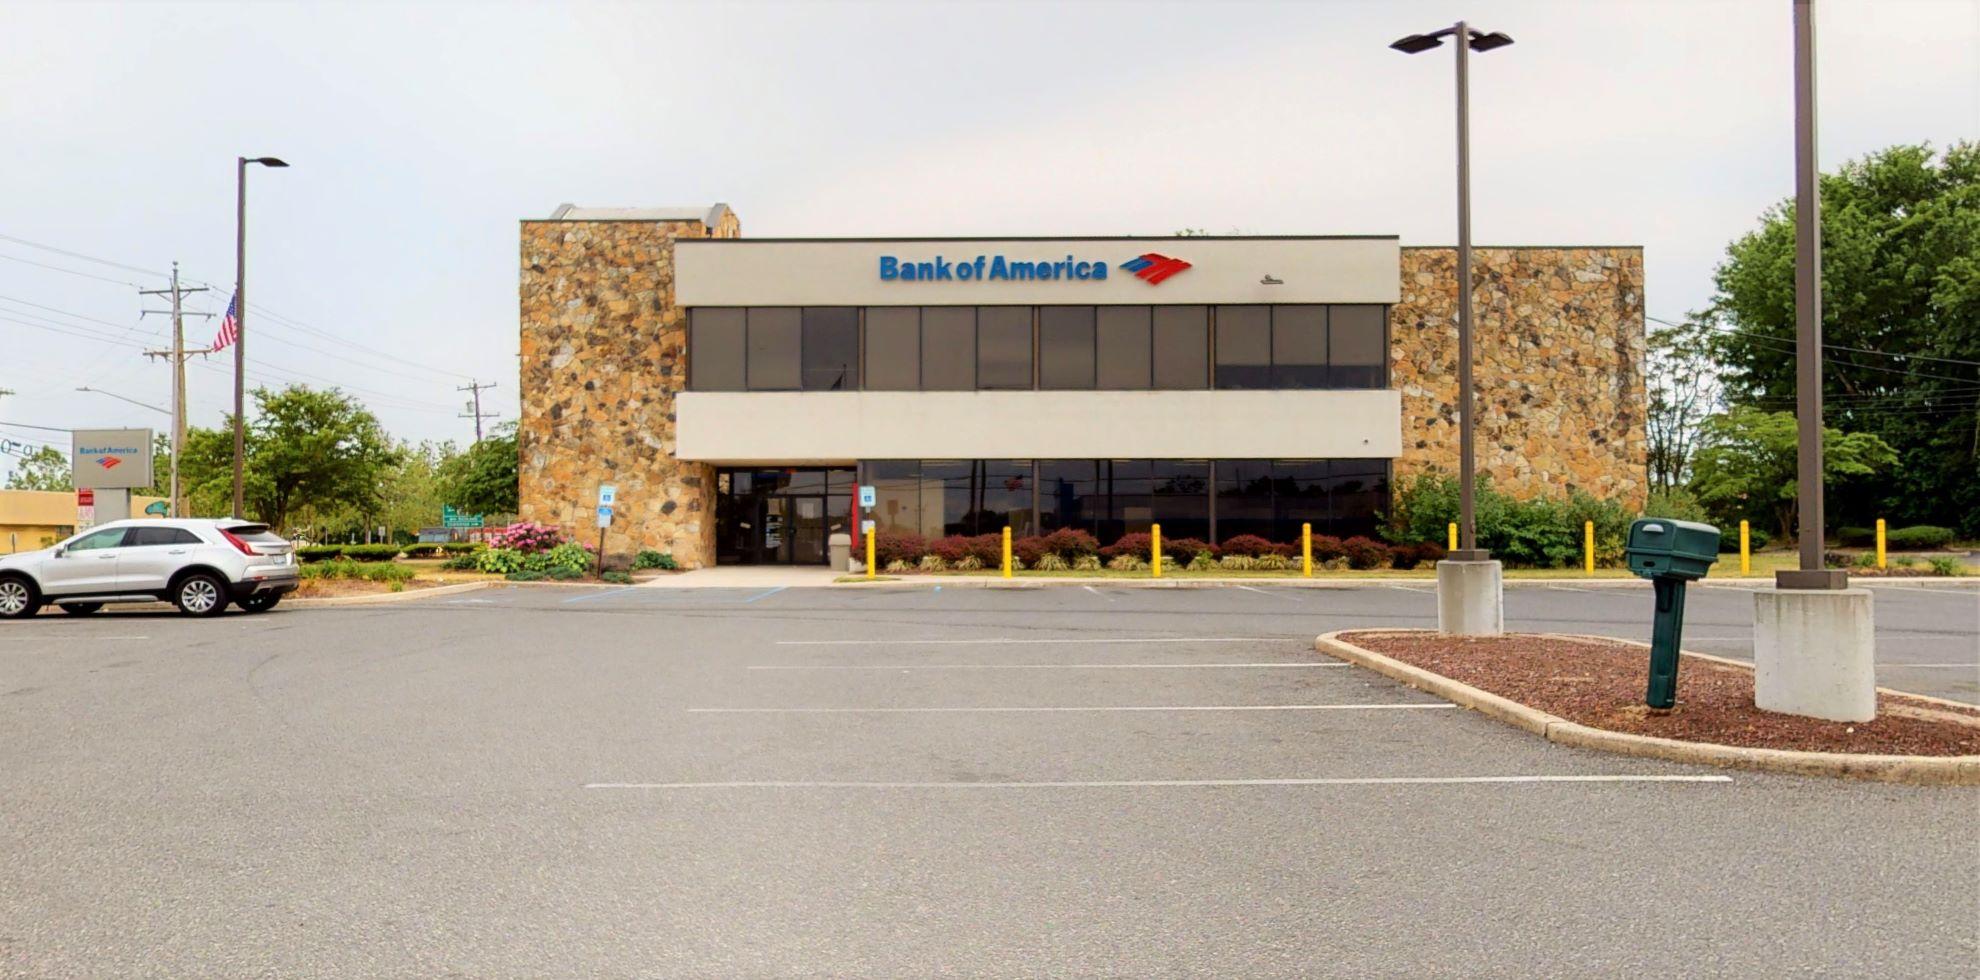 Bank of America financial center with drive-thru ATM   470 N Delsea Dr, Vineland, NJ 08360